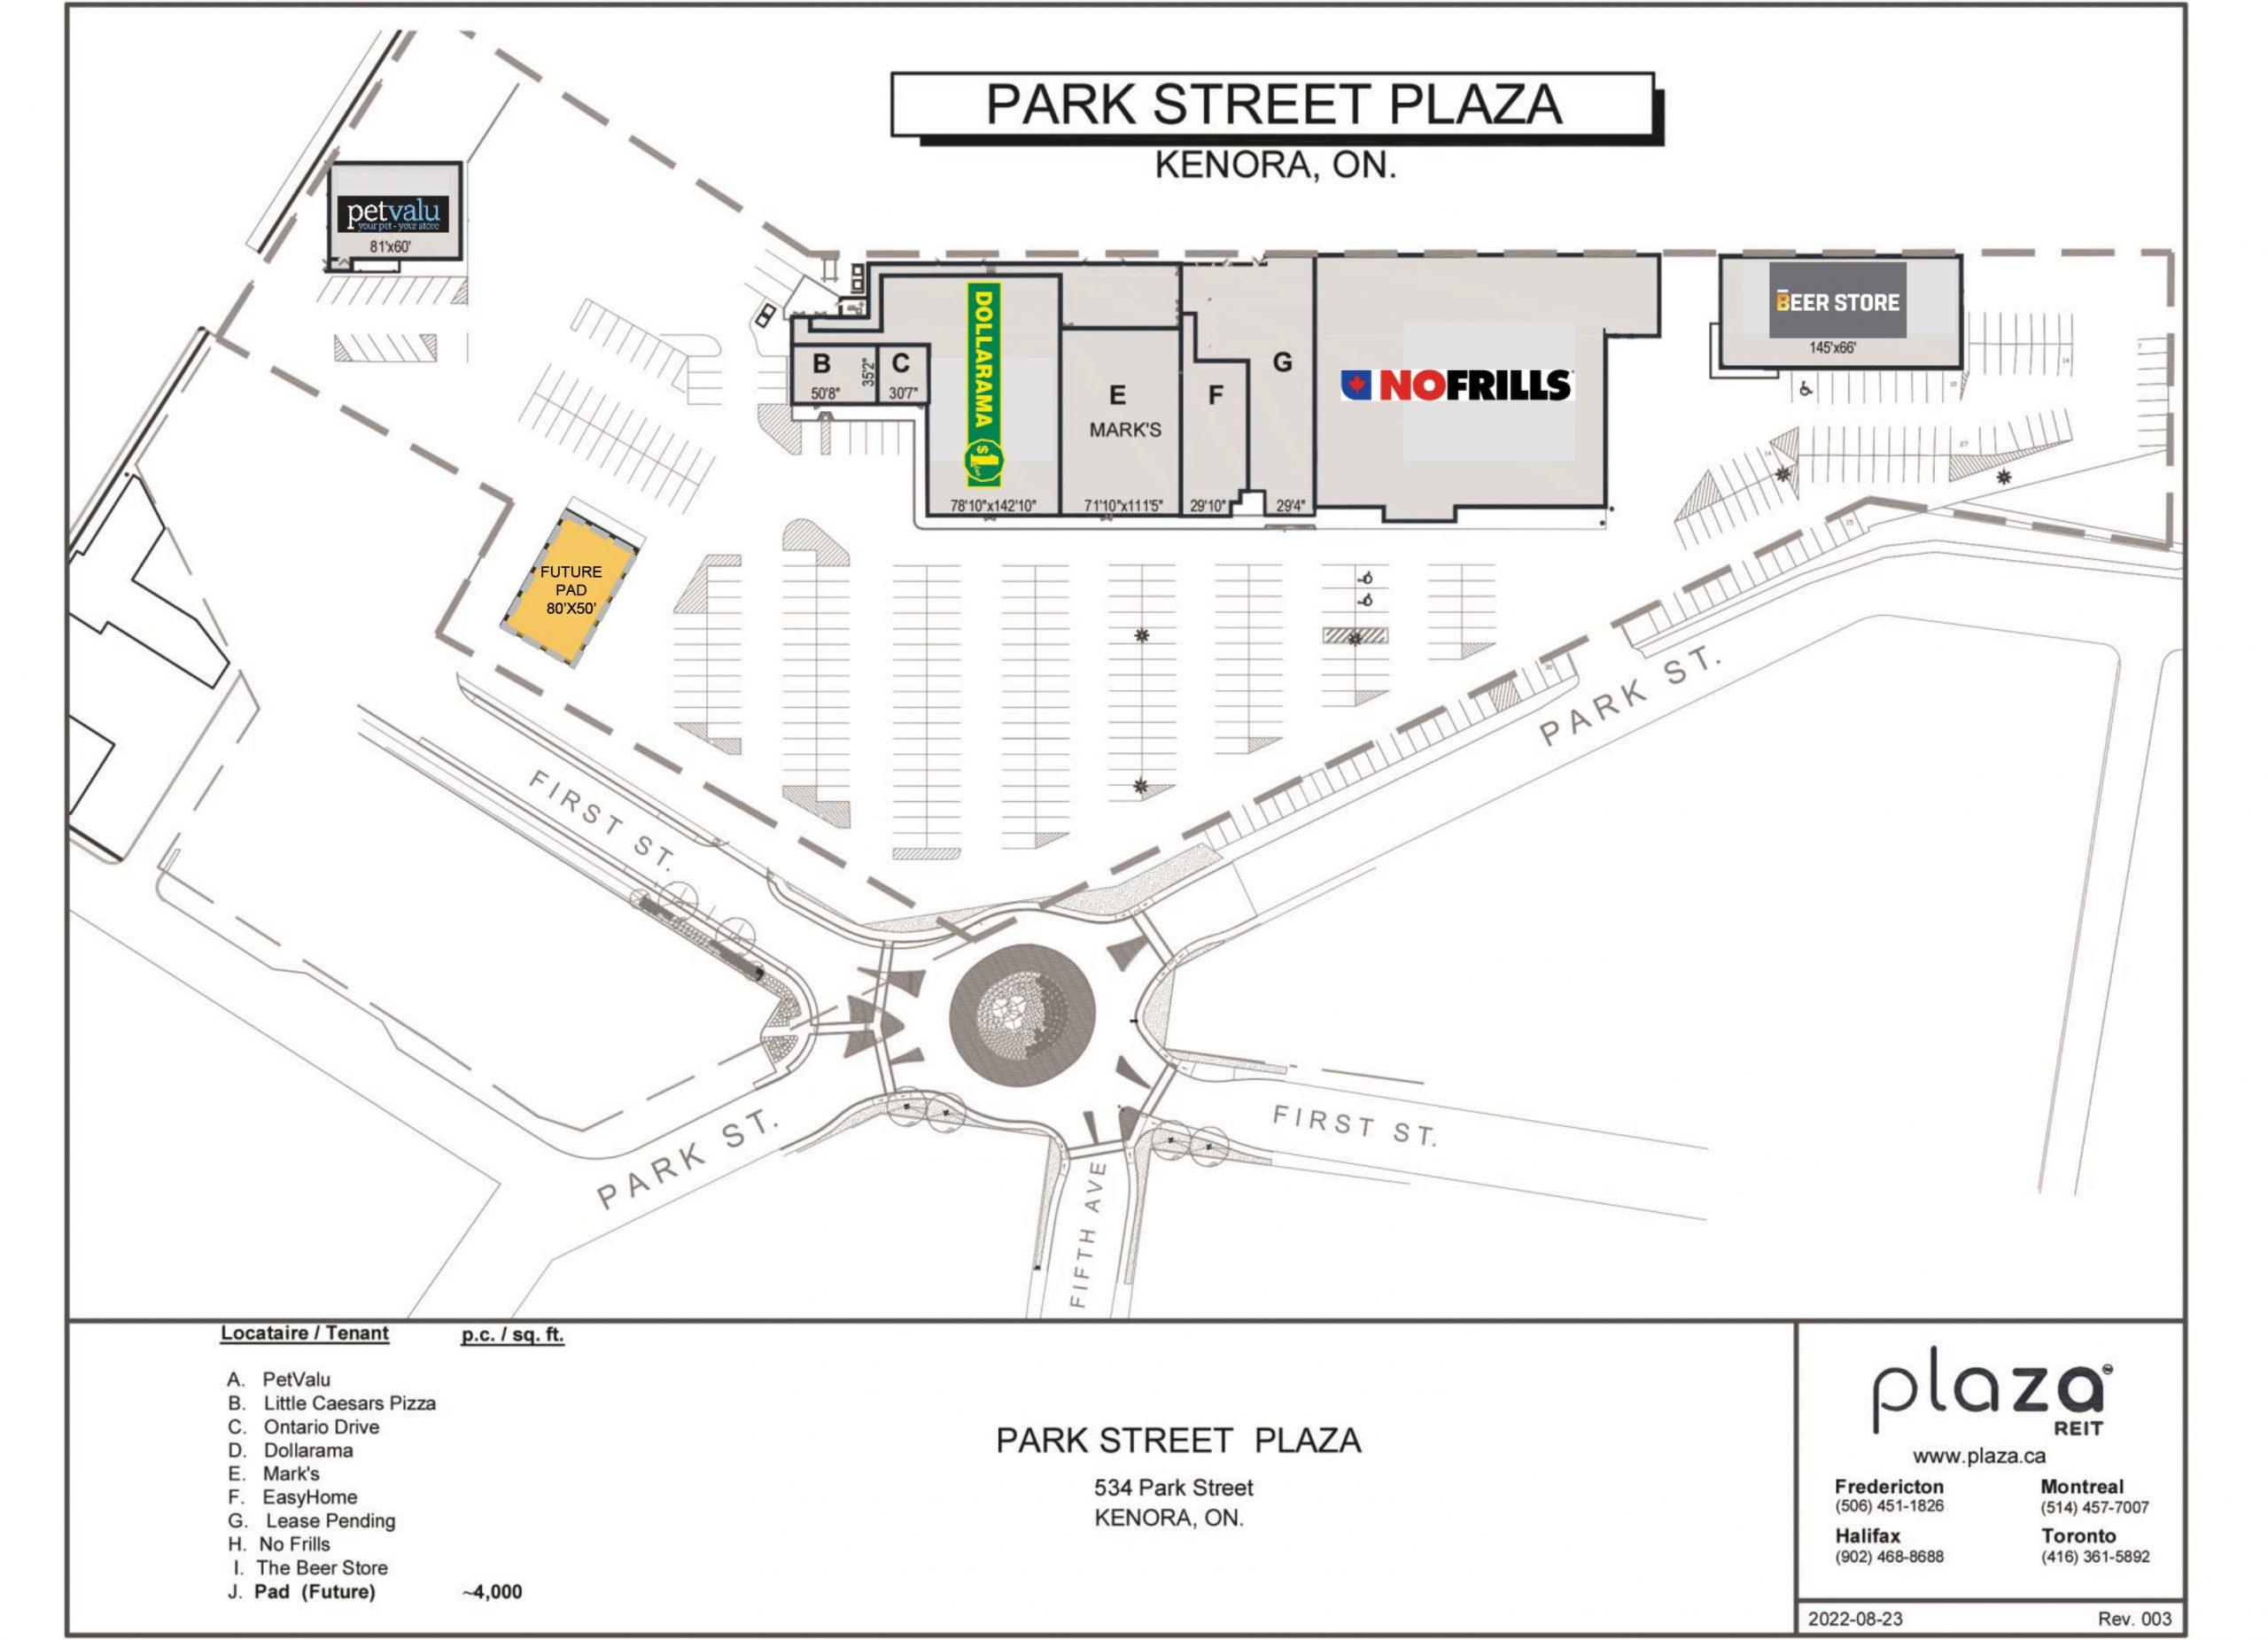 Map Of Kenora Canada.Kenora Shoppers Mall Park Street Plaza In Kenora Ontario 12